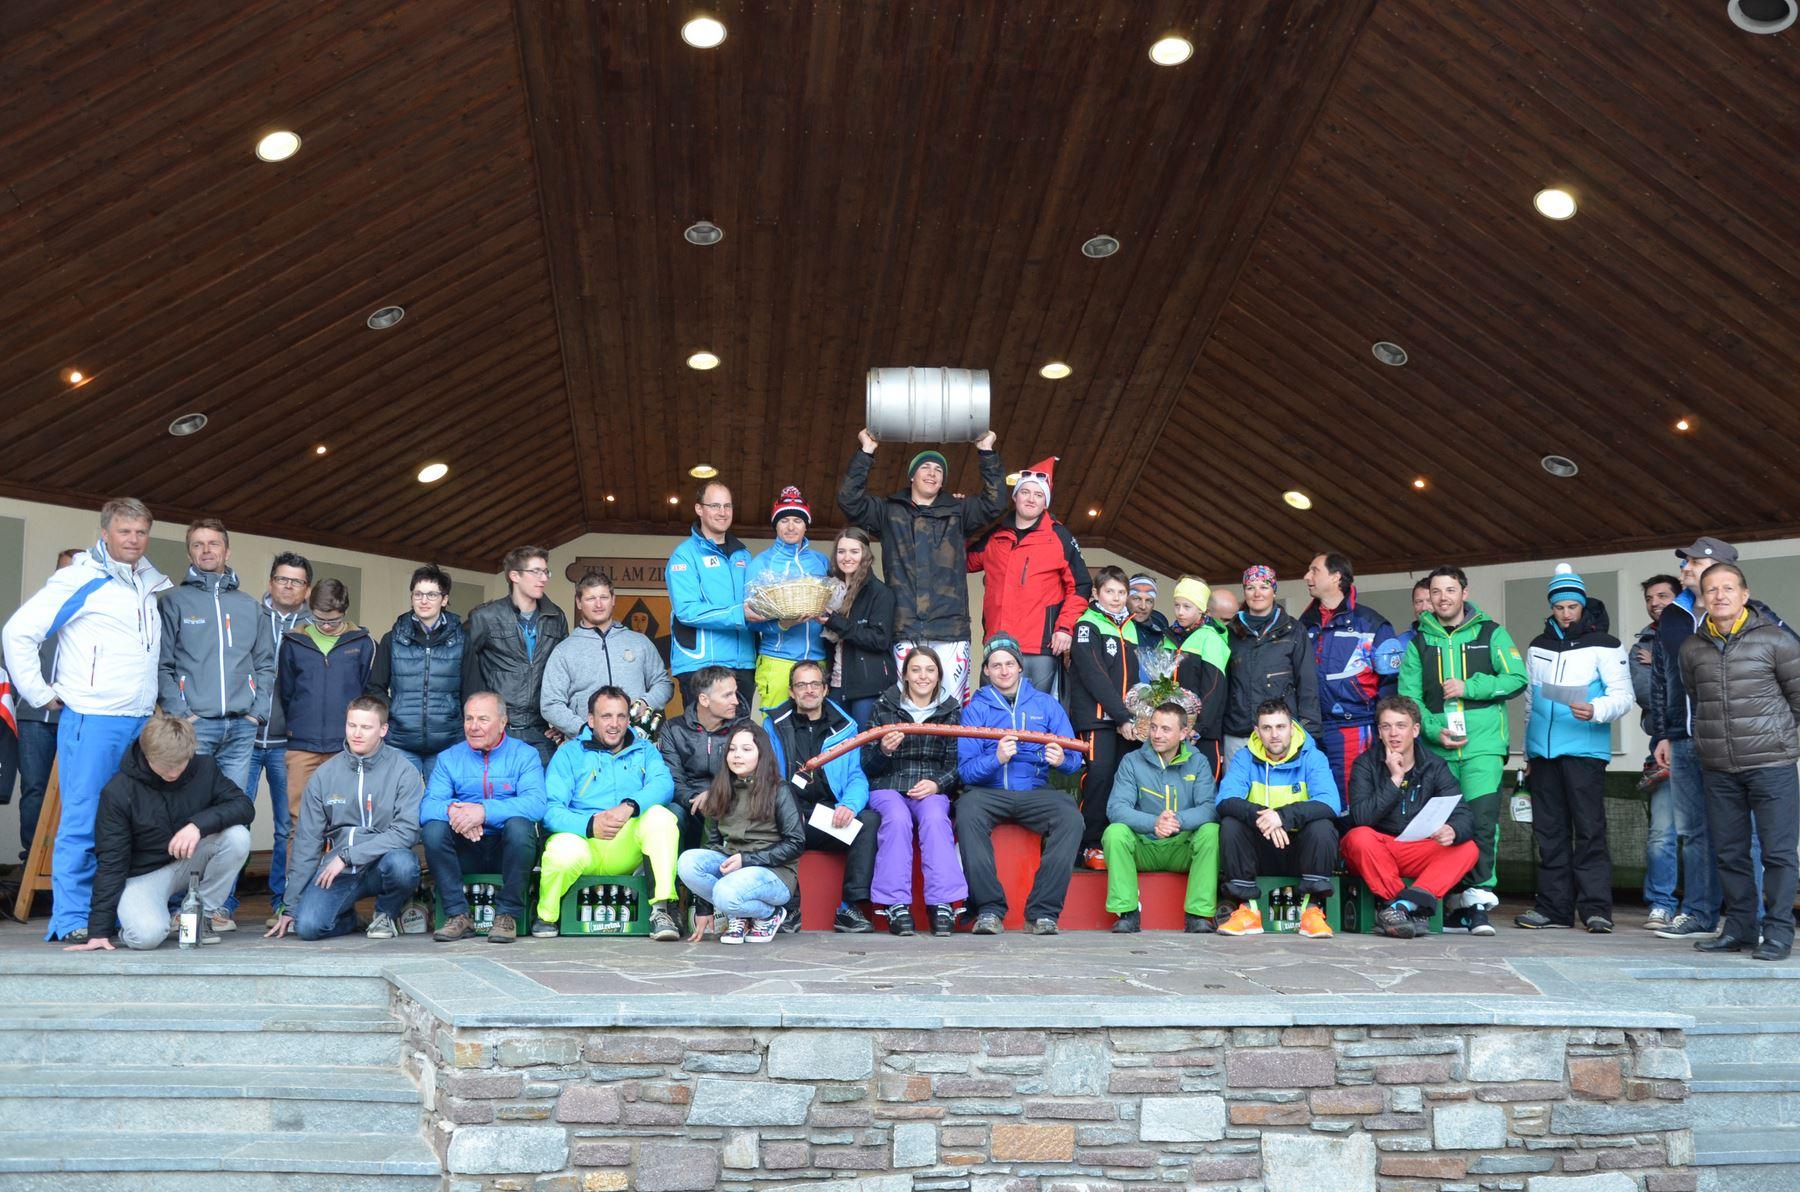 2015-03-22 BV Zillertal Skirennen 585.JPG